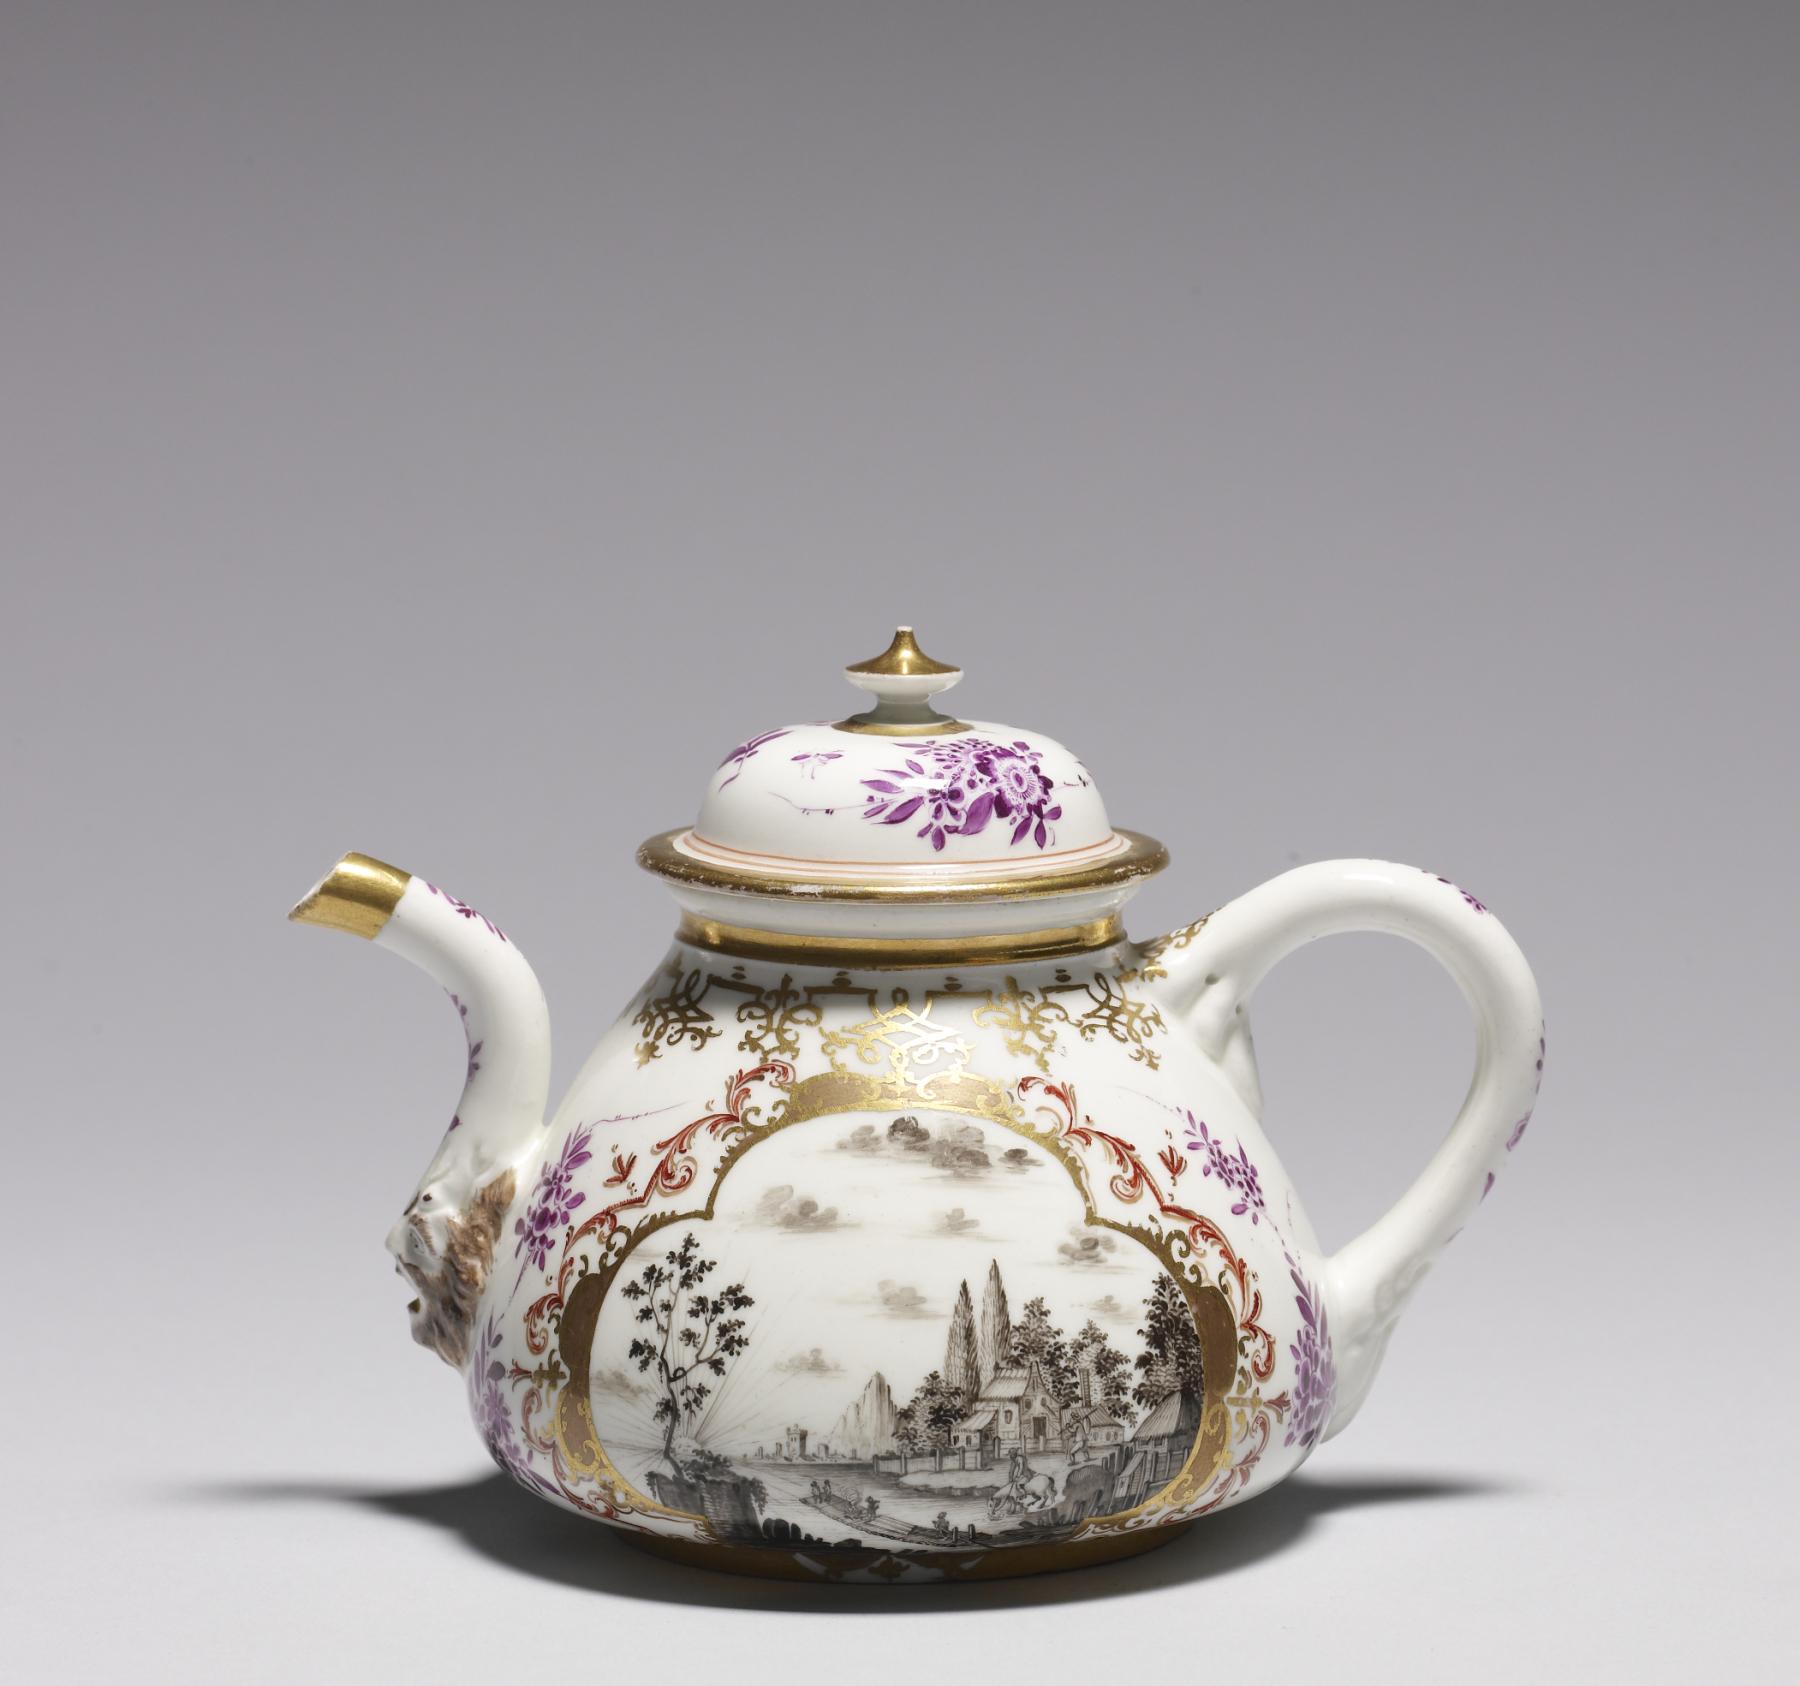 Meissen Keramik: 1000+ Images About Early Meissen Porcelain On Pinterest